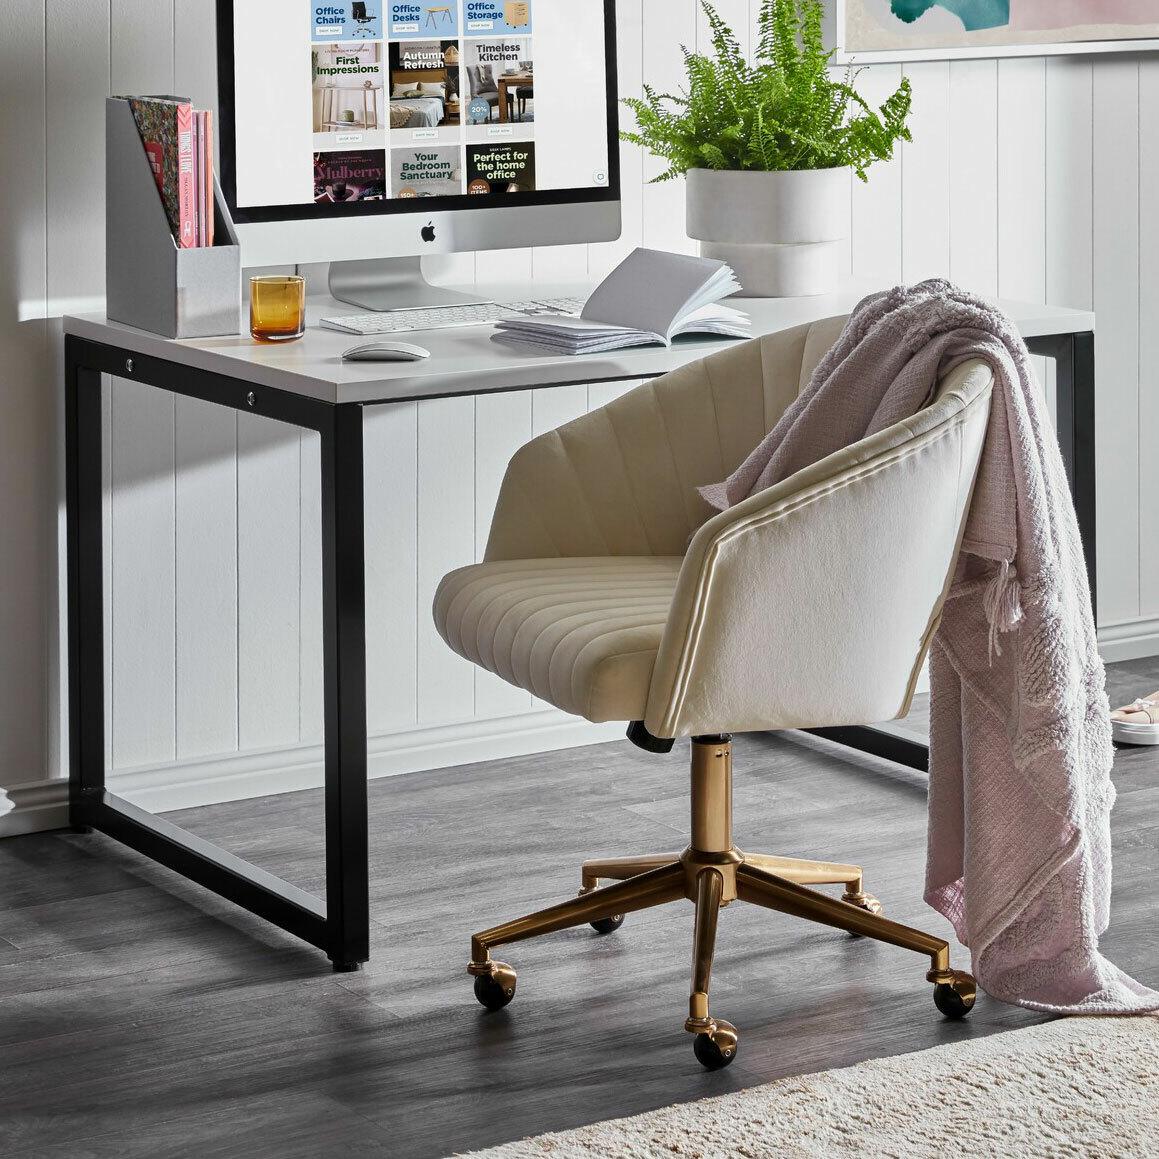 Home Office Designs Bridle Home Office Desk & Reviews | Temple & Webster